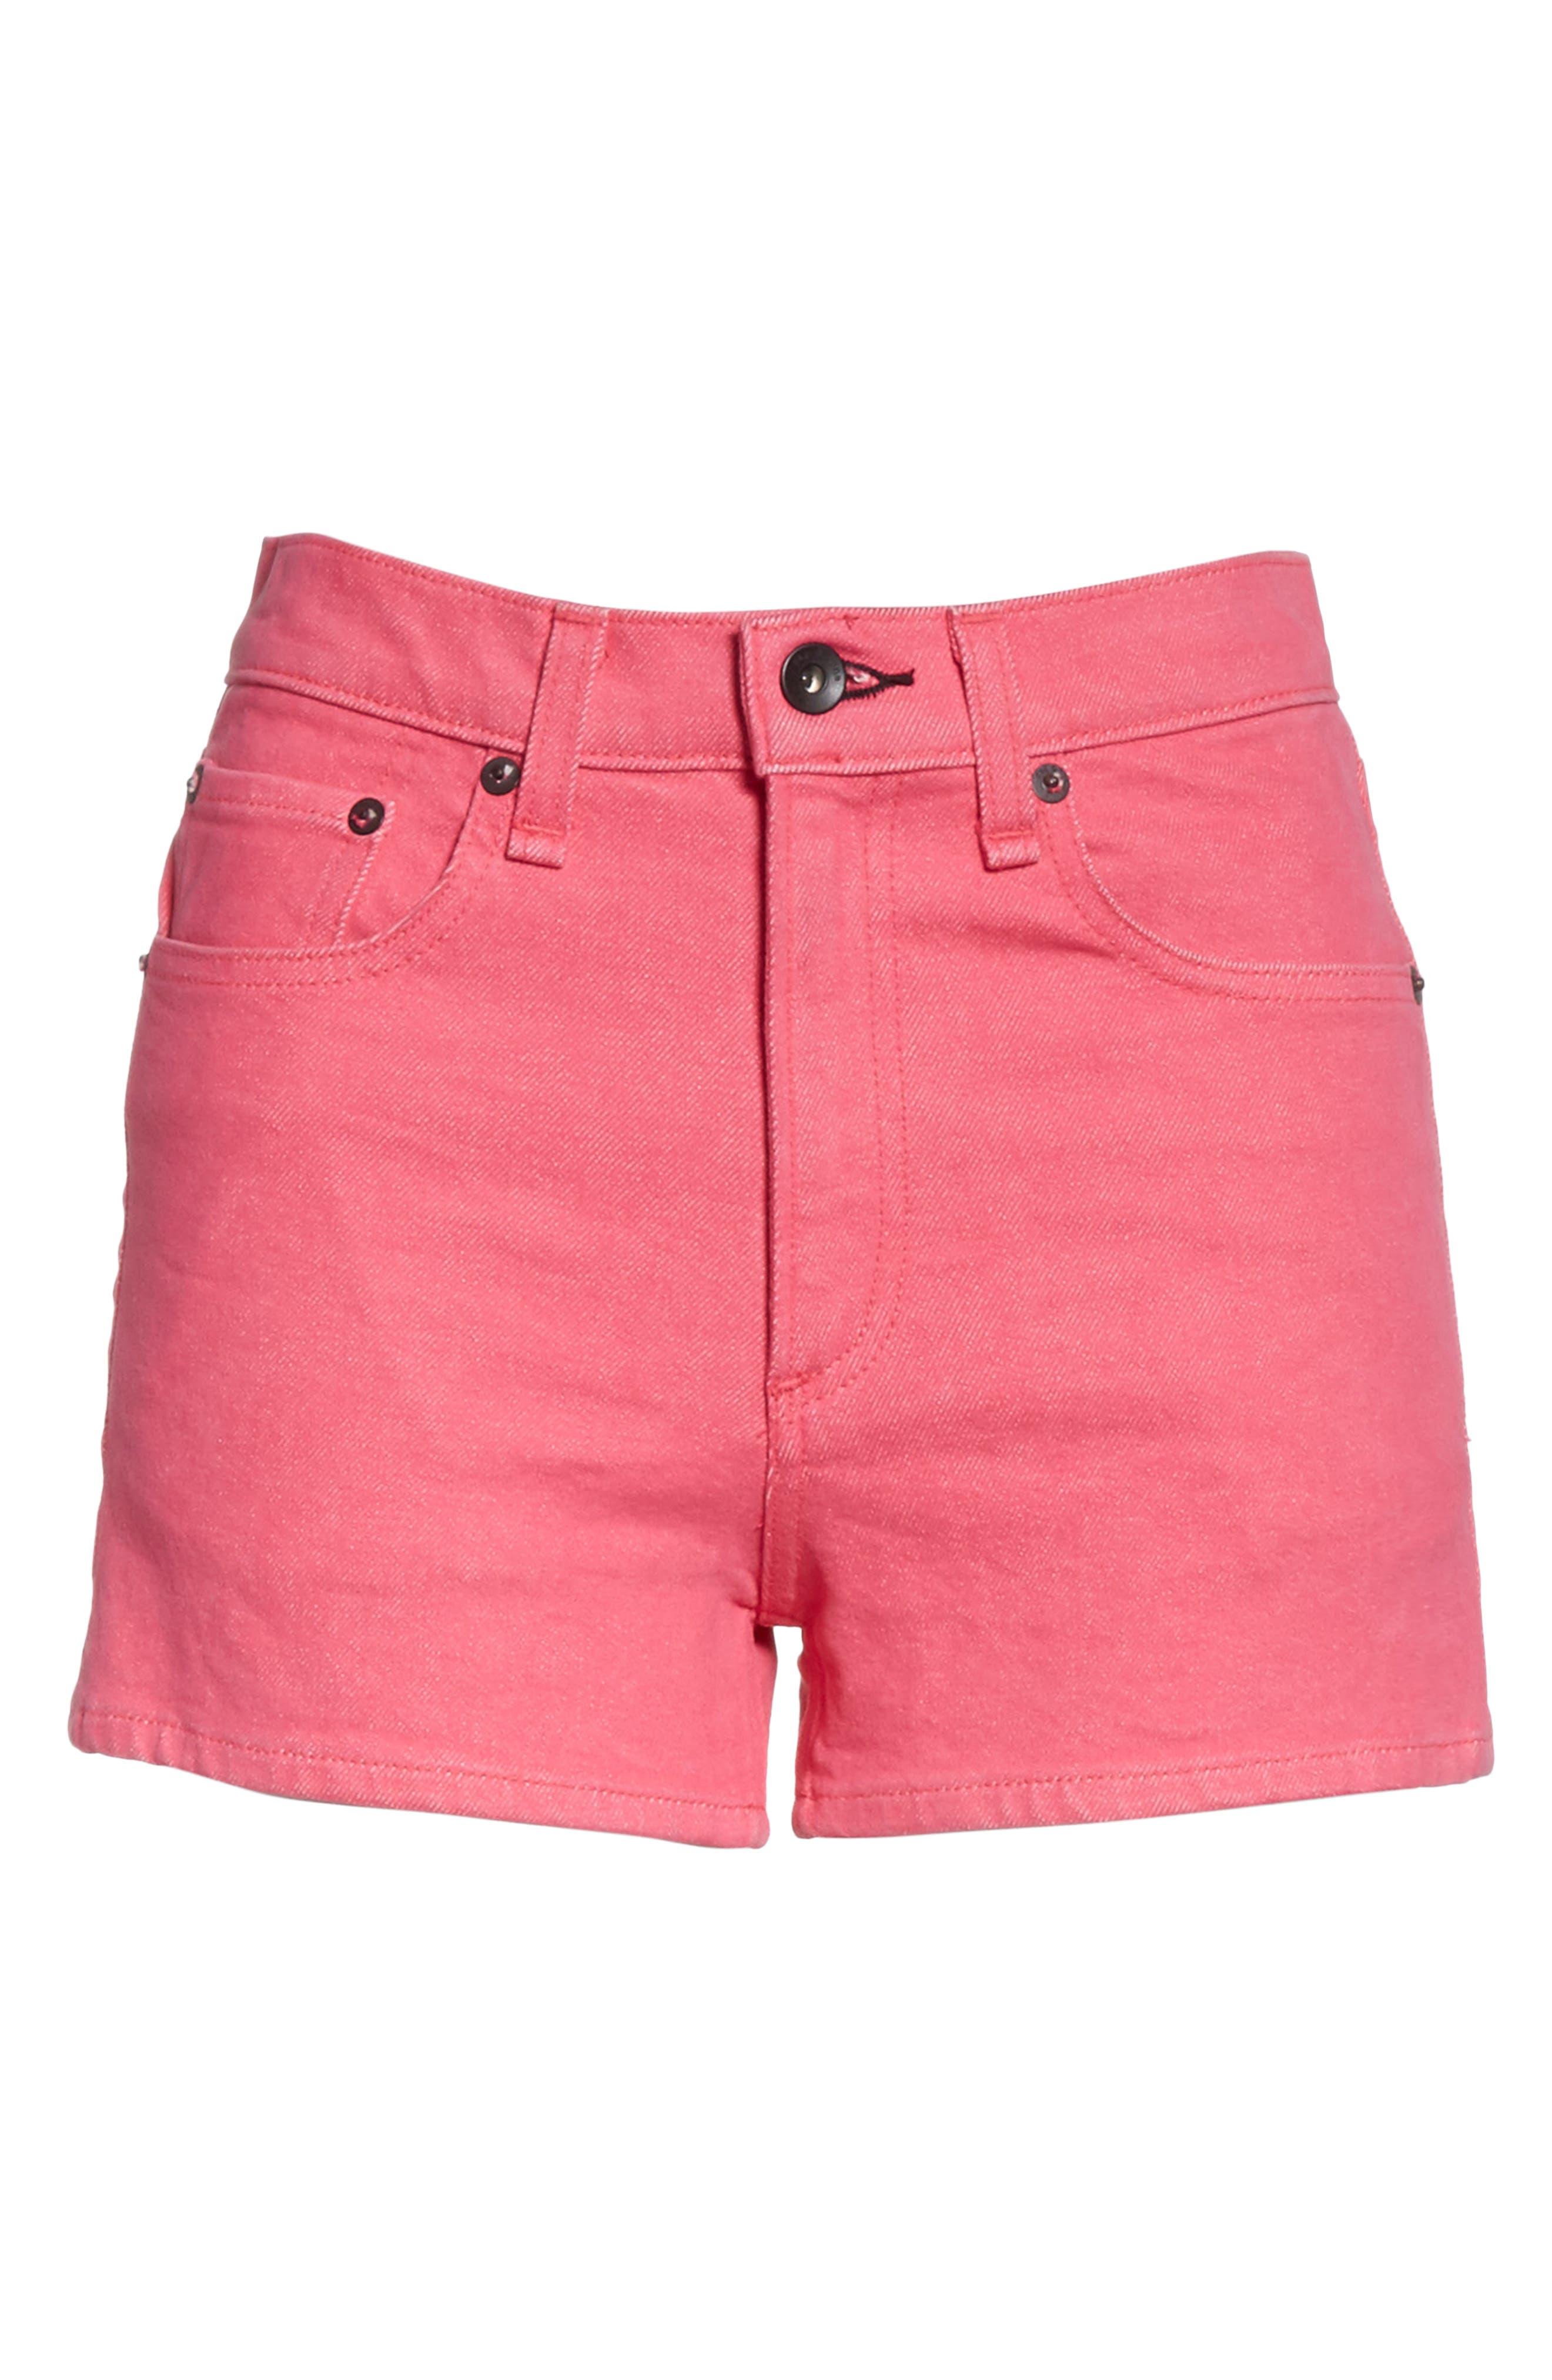 Justine High Waist Denim Shorts,                             Alternate thumbnail 7, color,                             Bull Pink